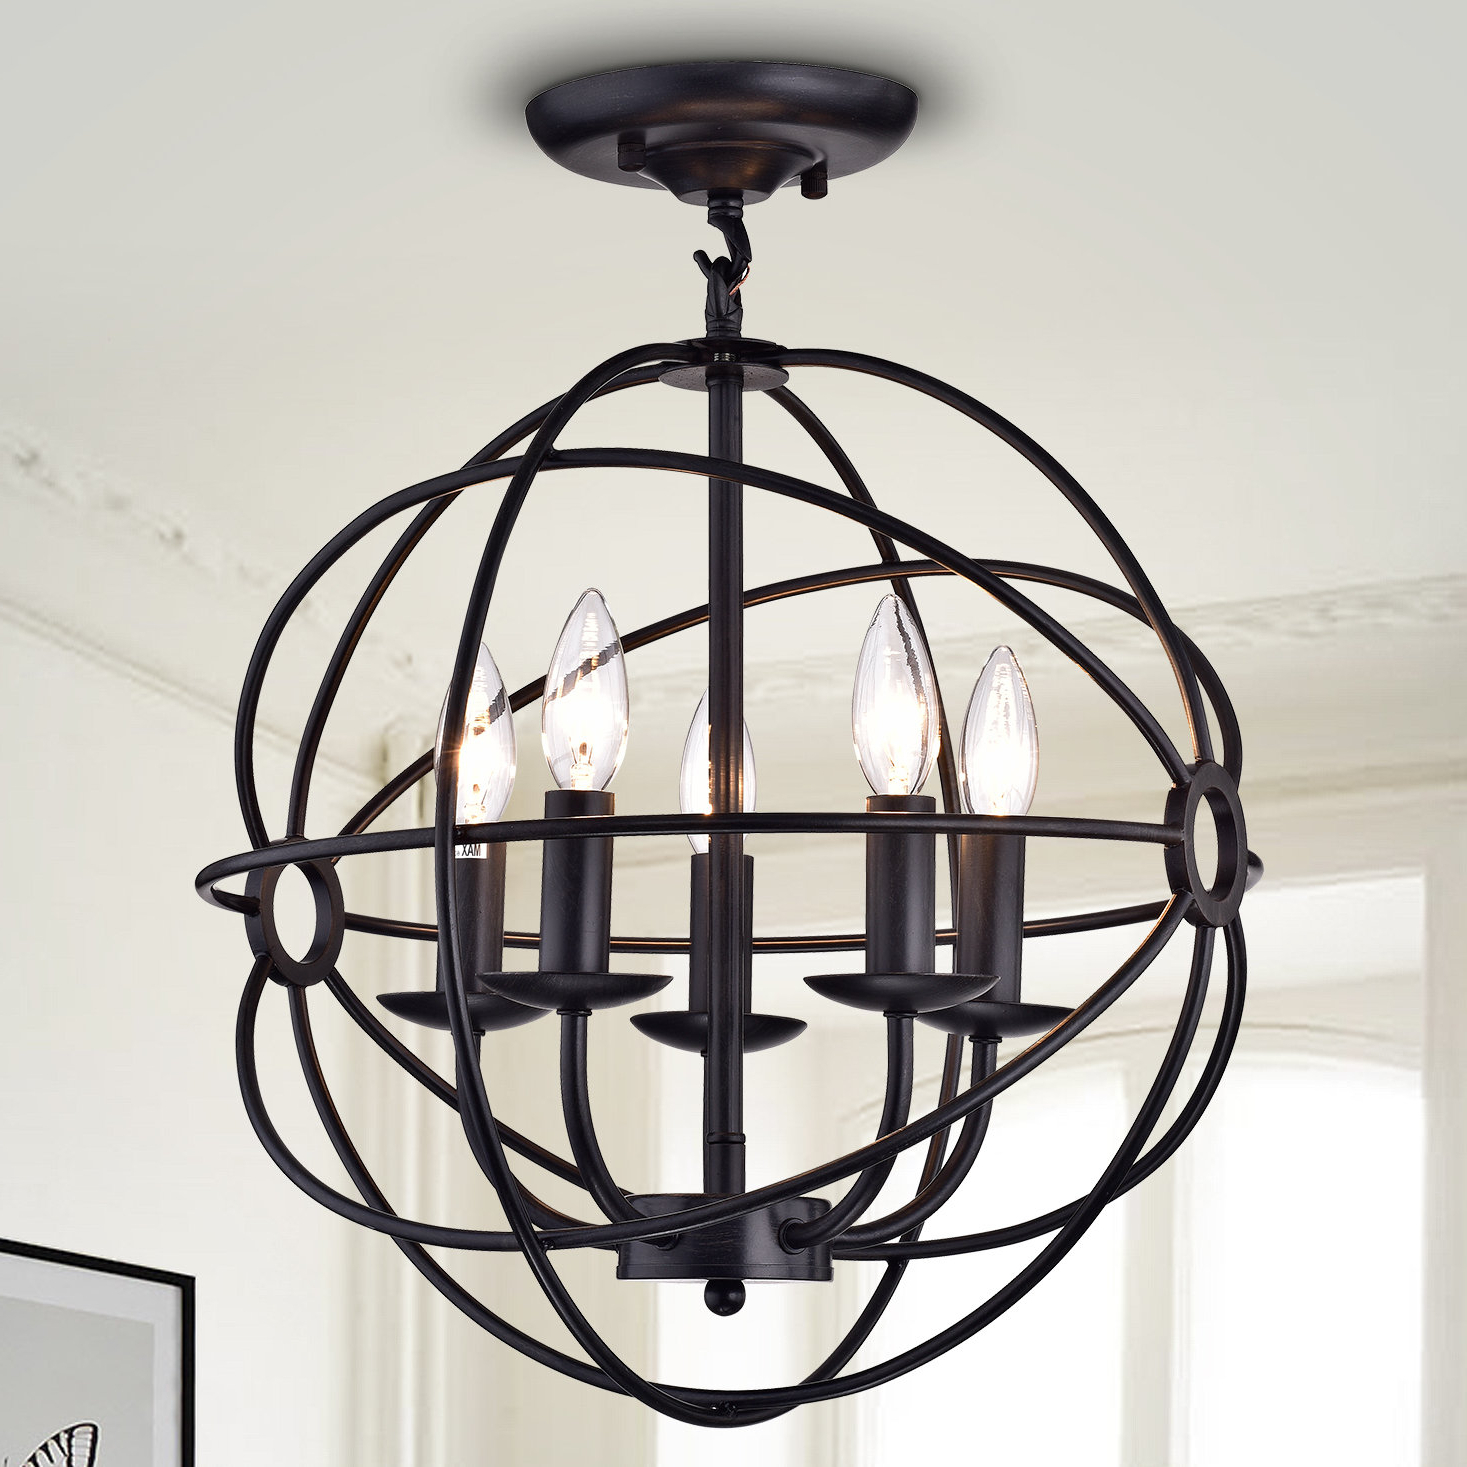 Newest Cavanagh 4 Light Geometric Chandeliers Inside 5 Light Globe Chandelier (View 10 of 20)